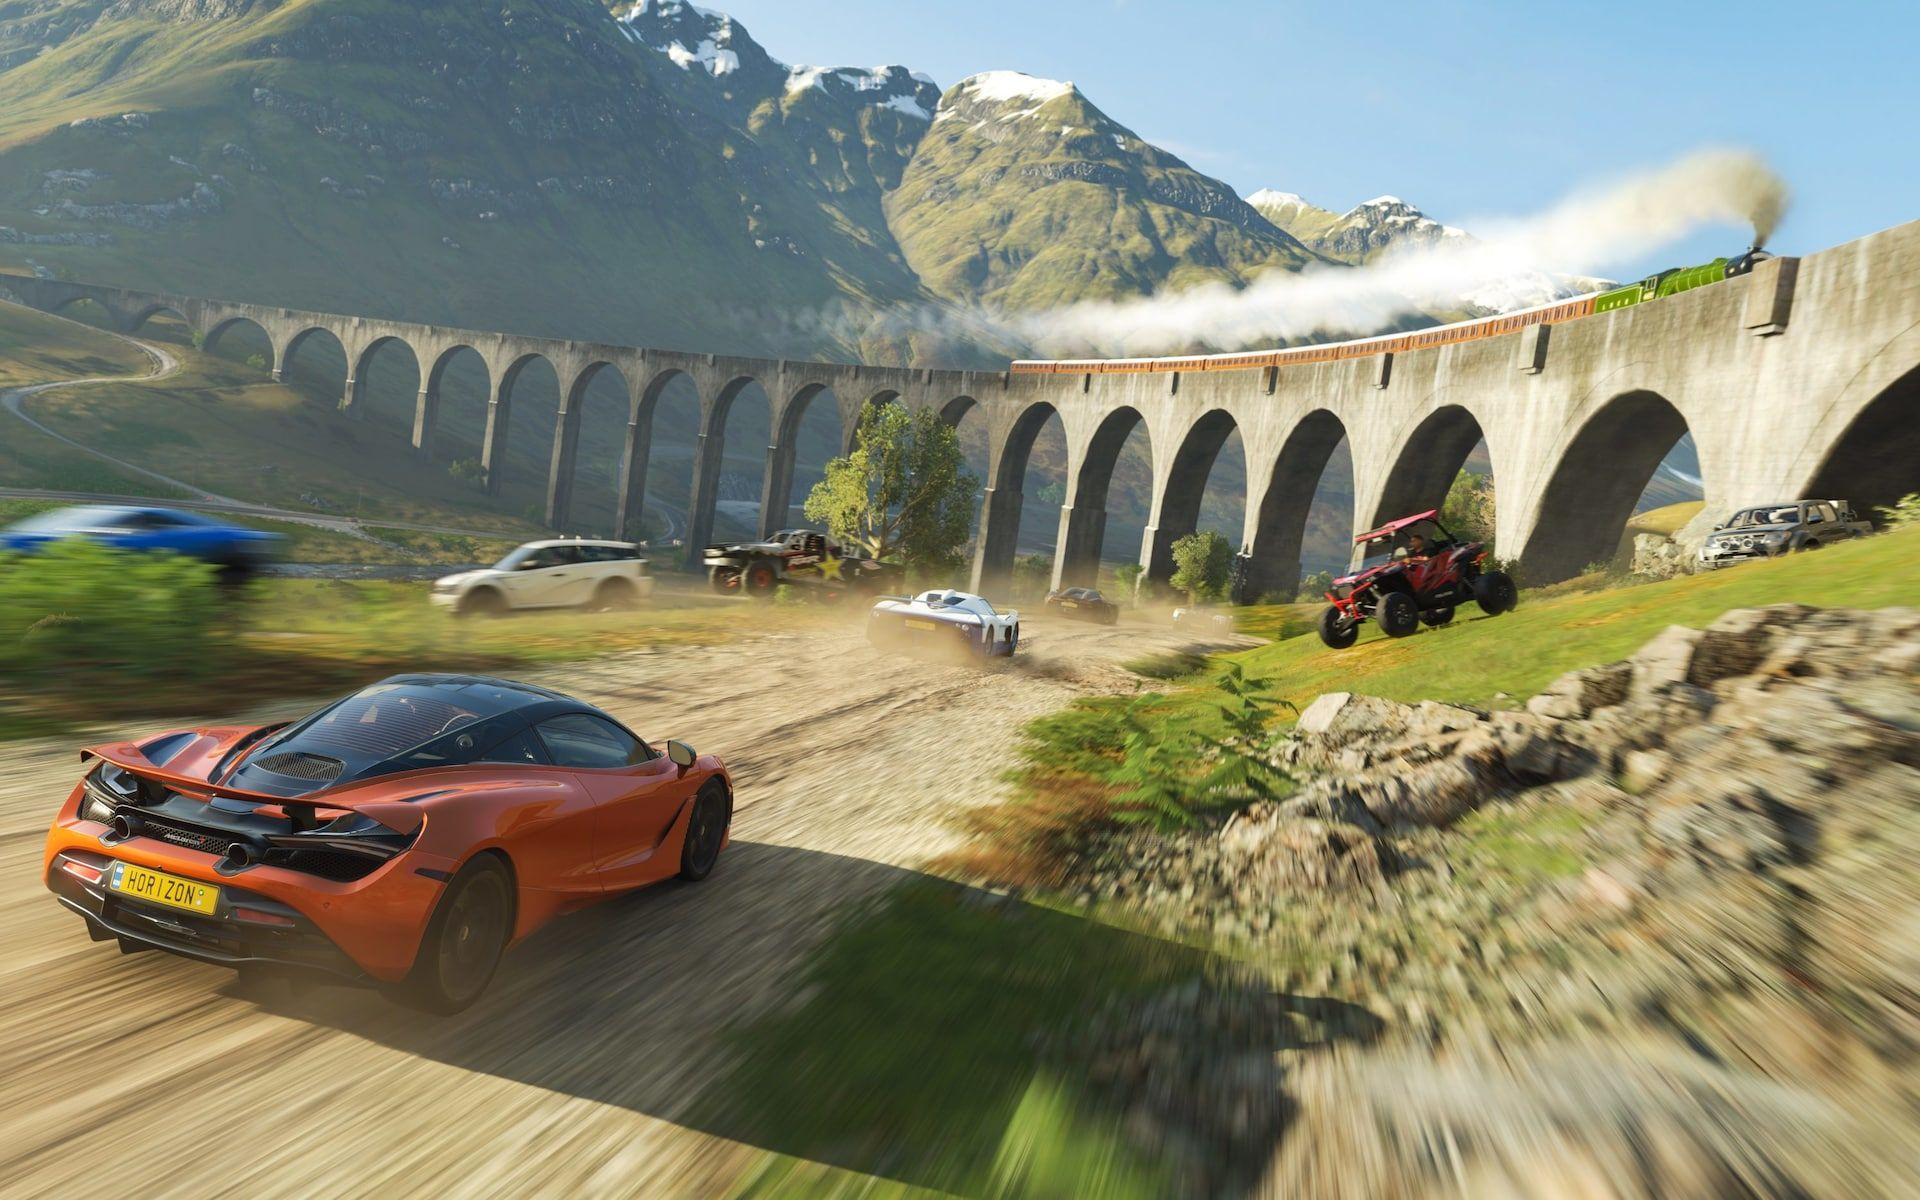 Forza Horizon 4 Review Forza Horizon 4 Racing Games